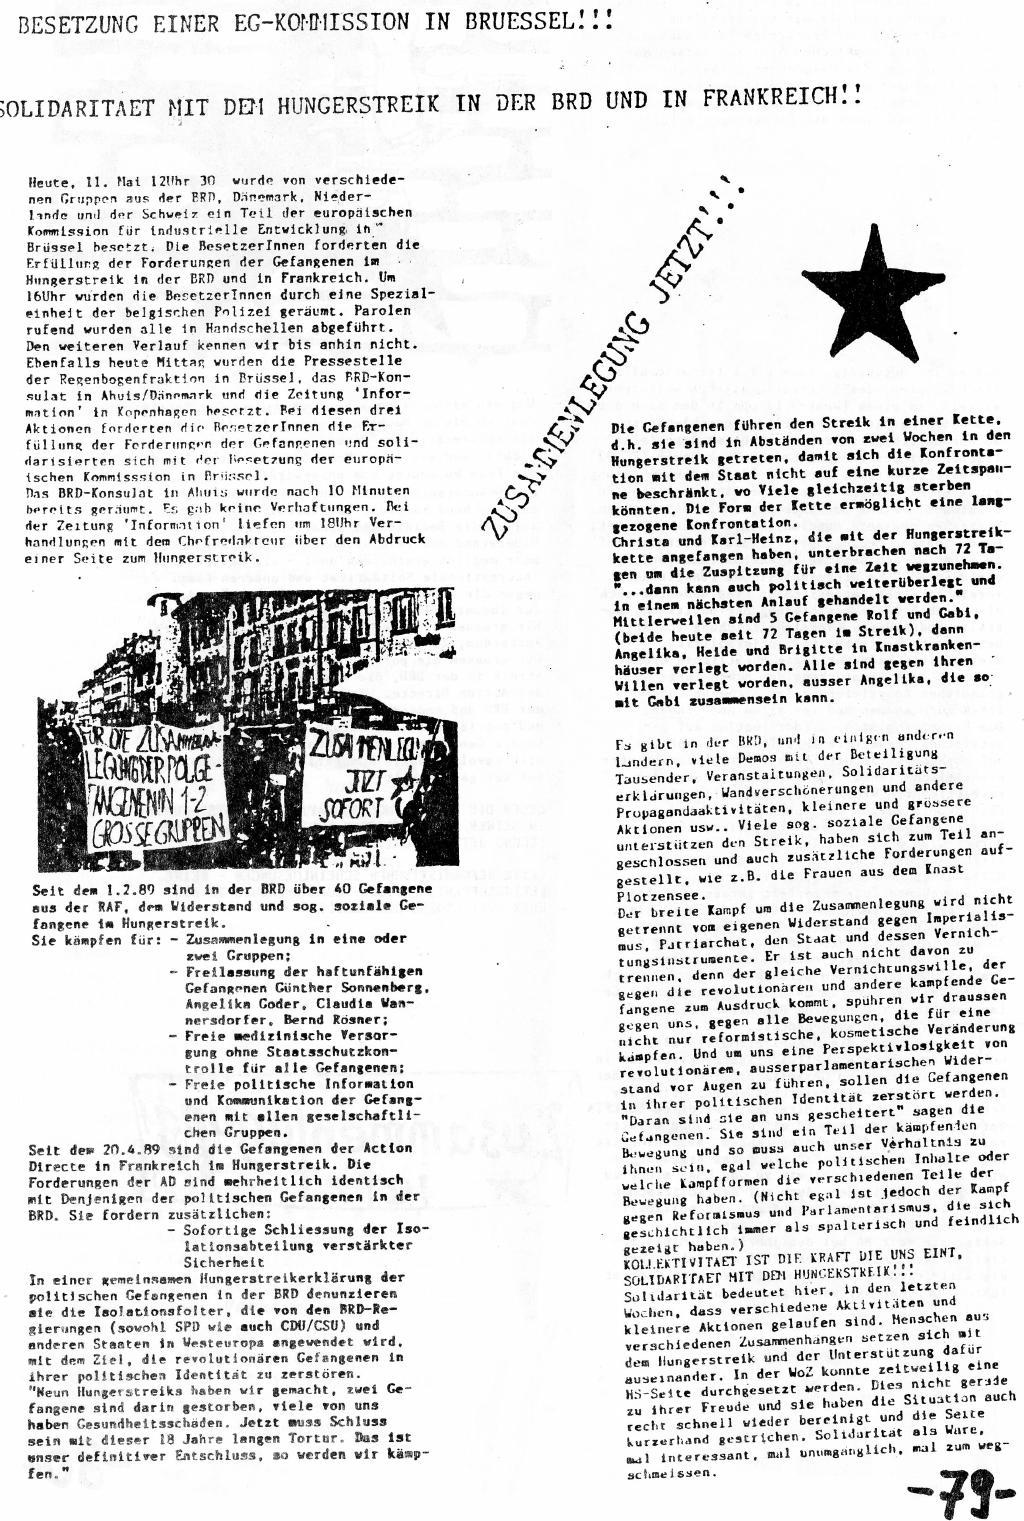 Belgien_Doku_Besetzung_EG_Kommission_1989_081